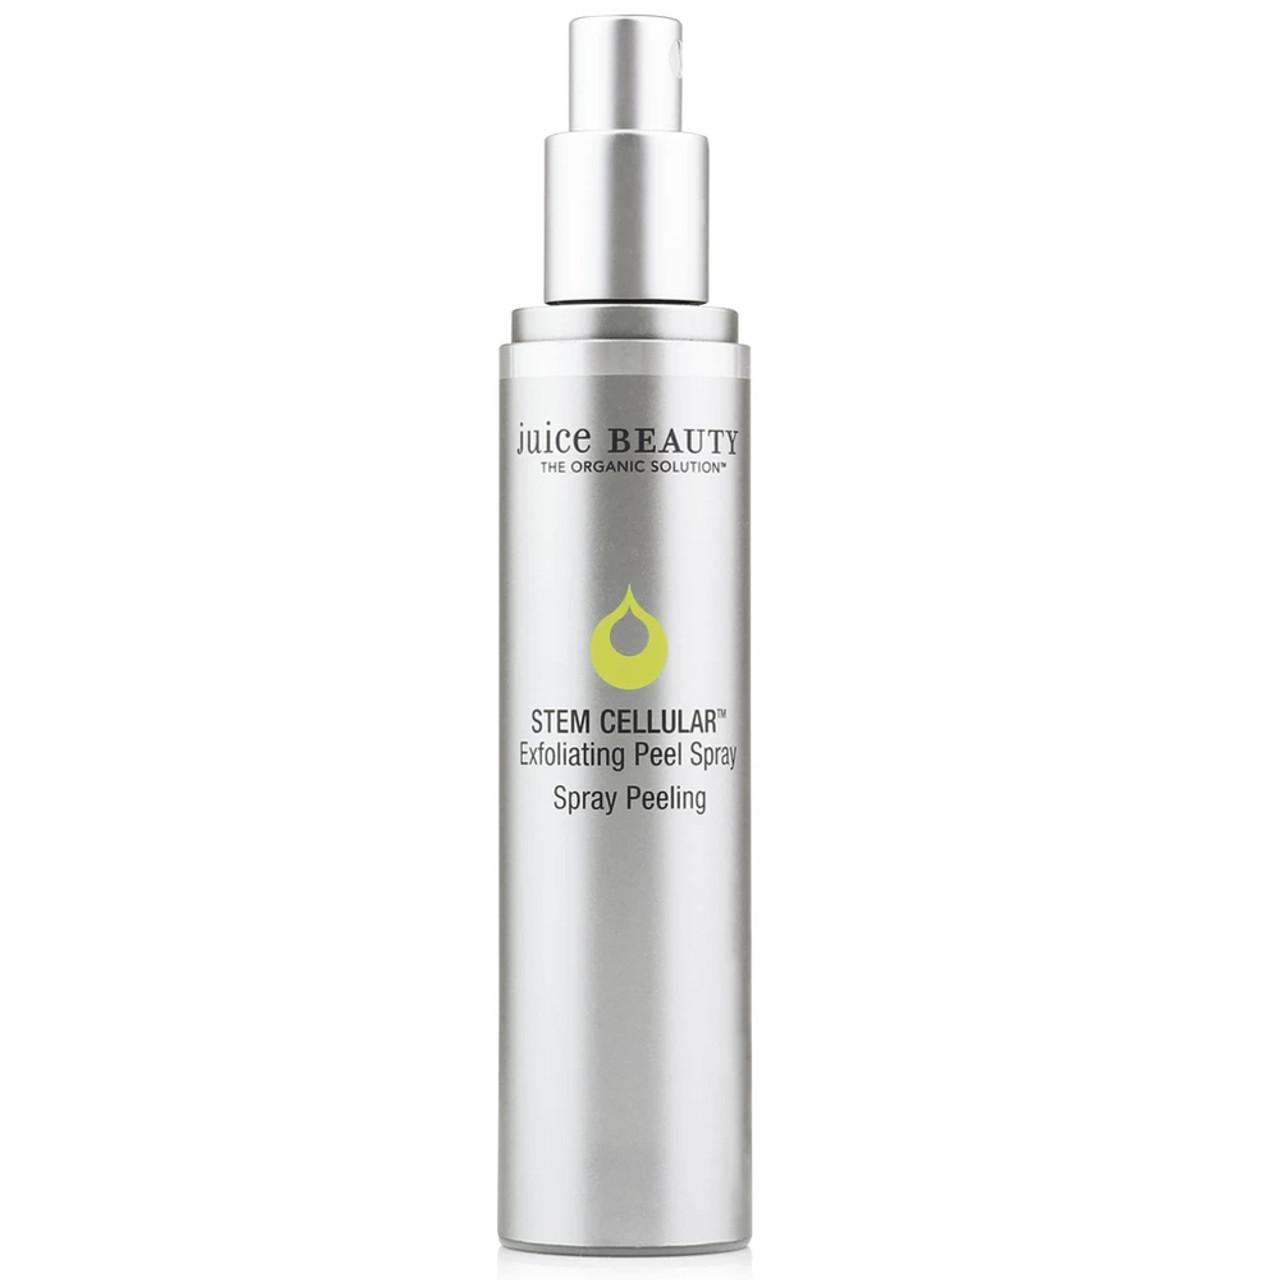 Juice Beauty SC Exfoliating Peel Spray